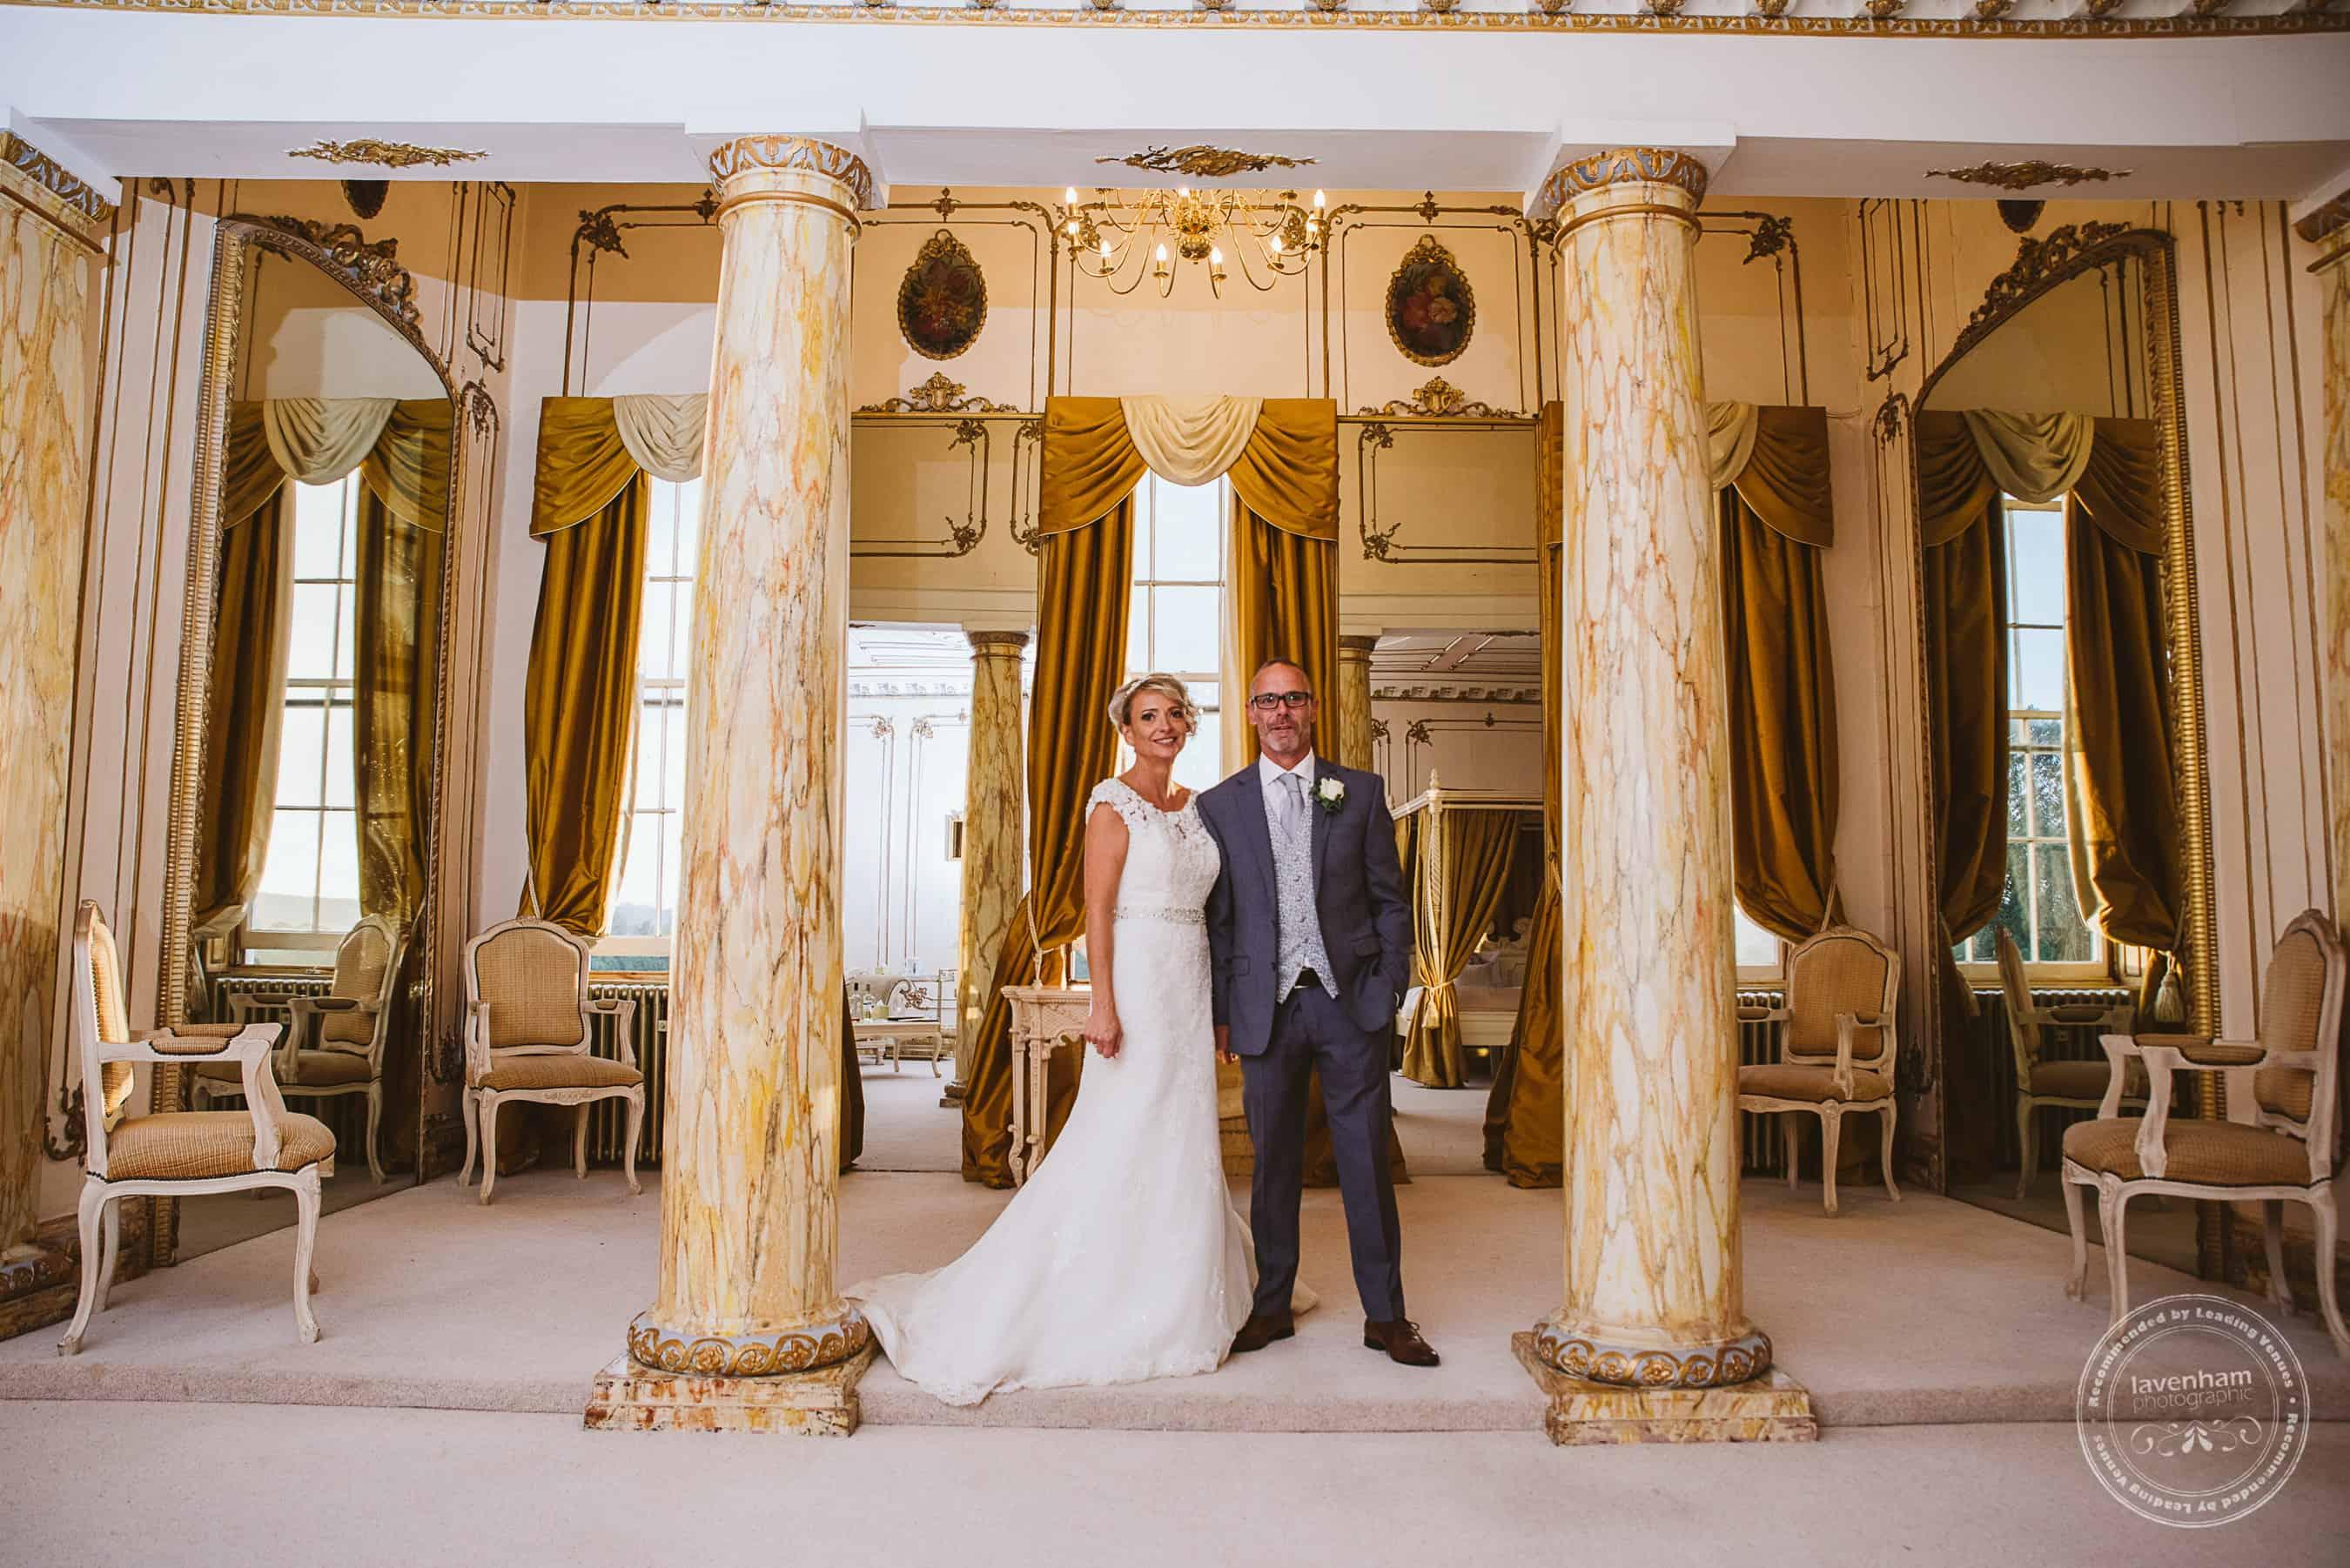 281018 Gosfield Hall Wedding Photography Lavenham Photographic 098